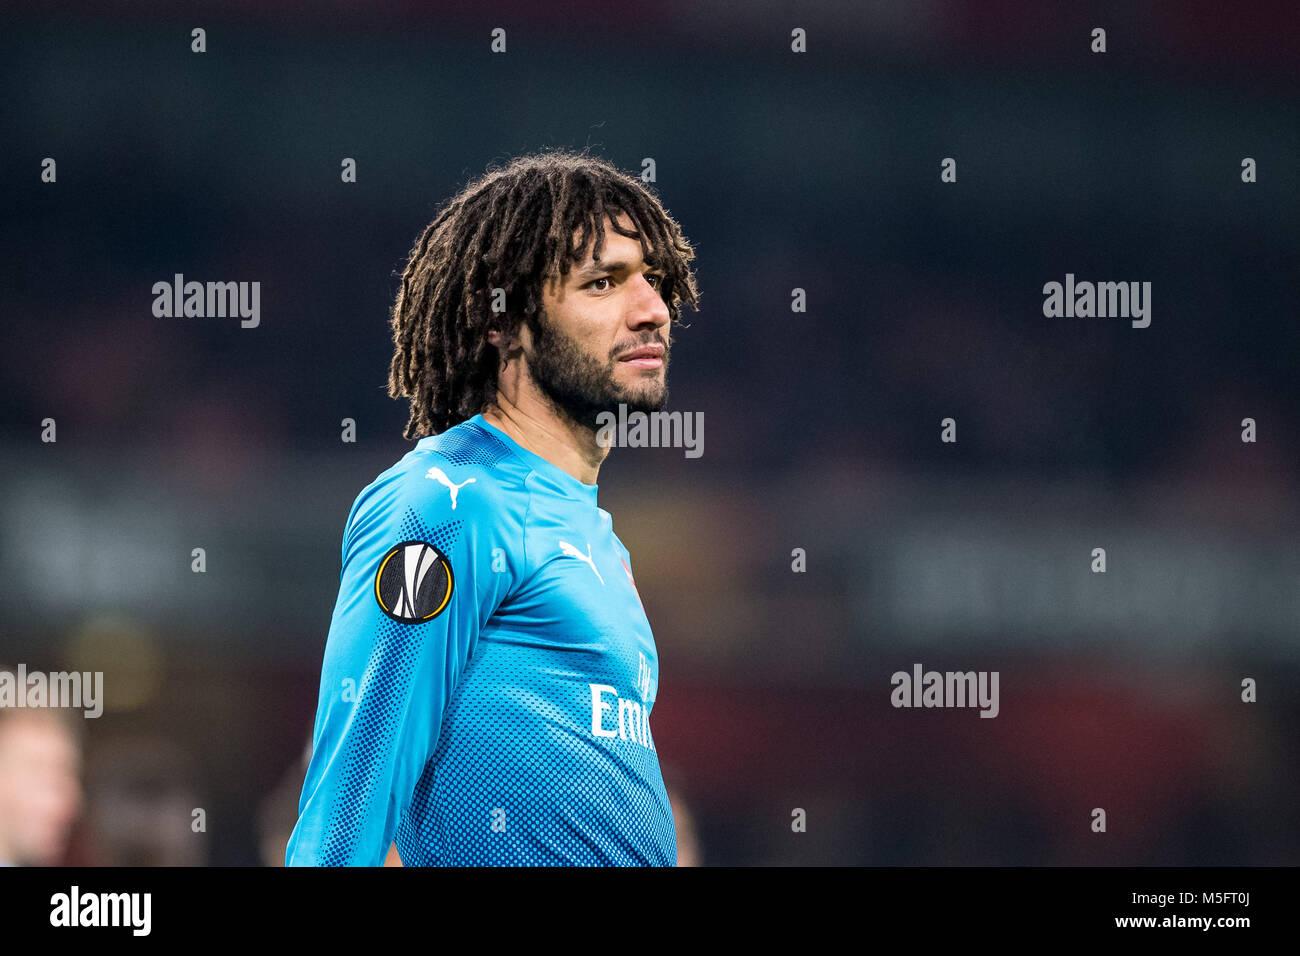 LONDON, ENGLAND - FEBRUARY 22: Mohamed Elneny (35) of Arsenal during UEFA Europa League Round of 32 match between Stock Photo